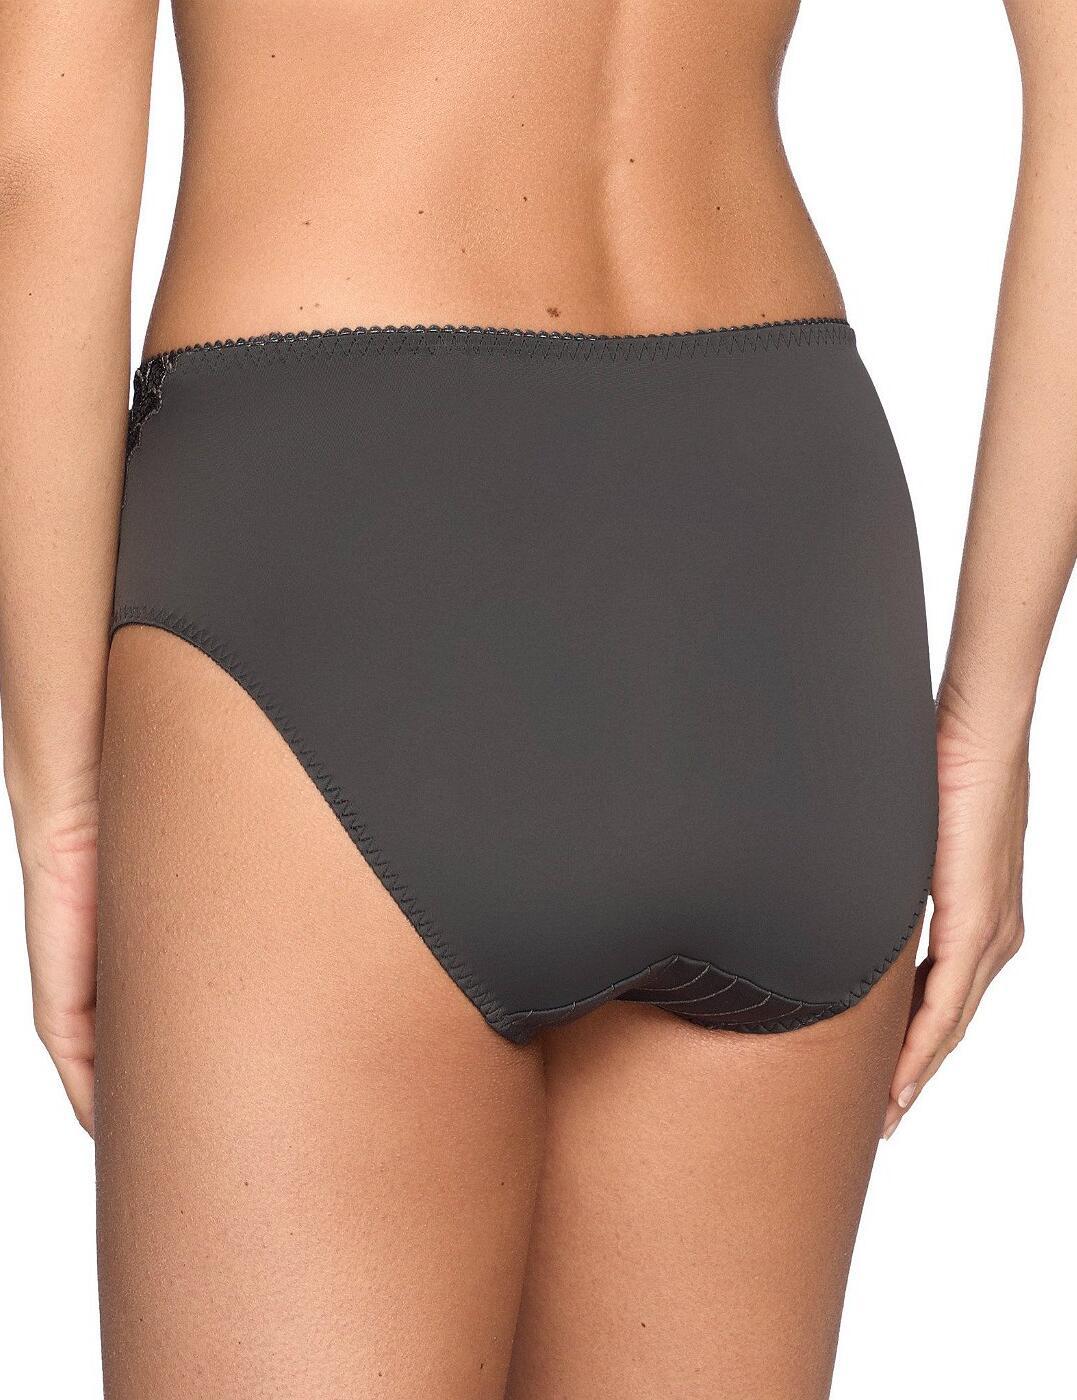 Prima-Donna-Deauville-Volle-Unterhose-Slip-Slips-Pant-0561811-Luxus-Dessous Indexbild 16